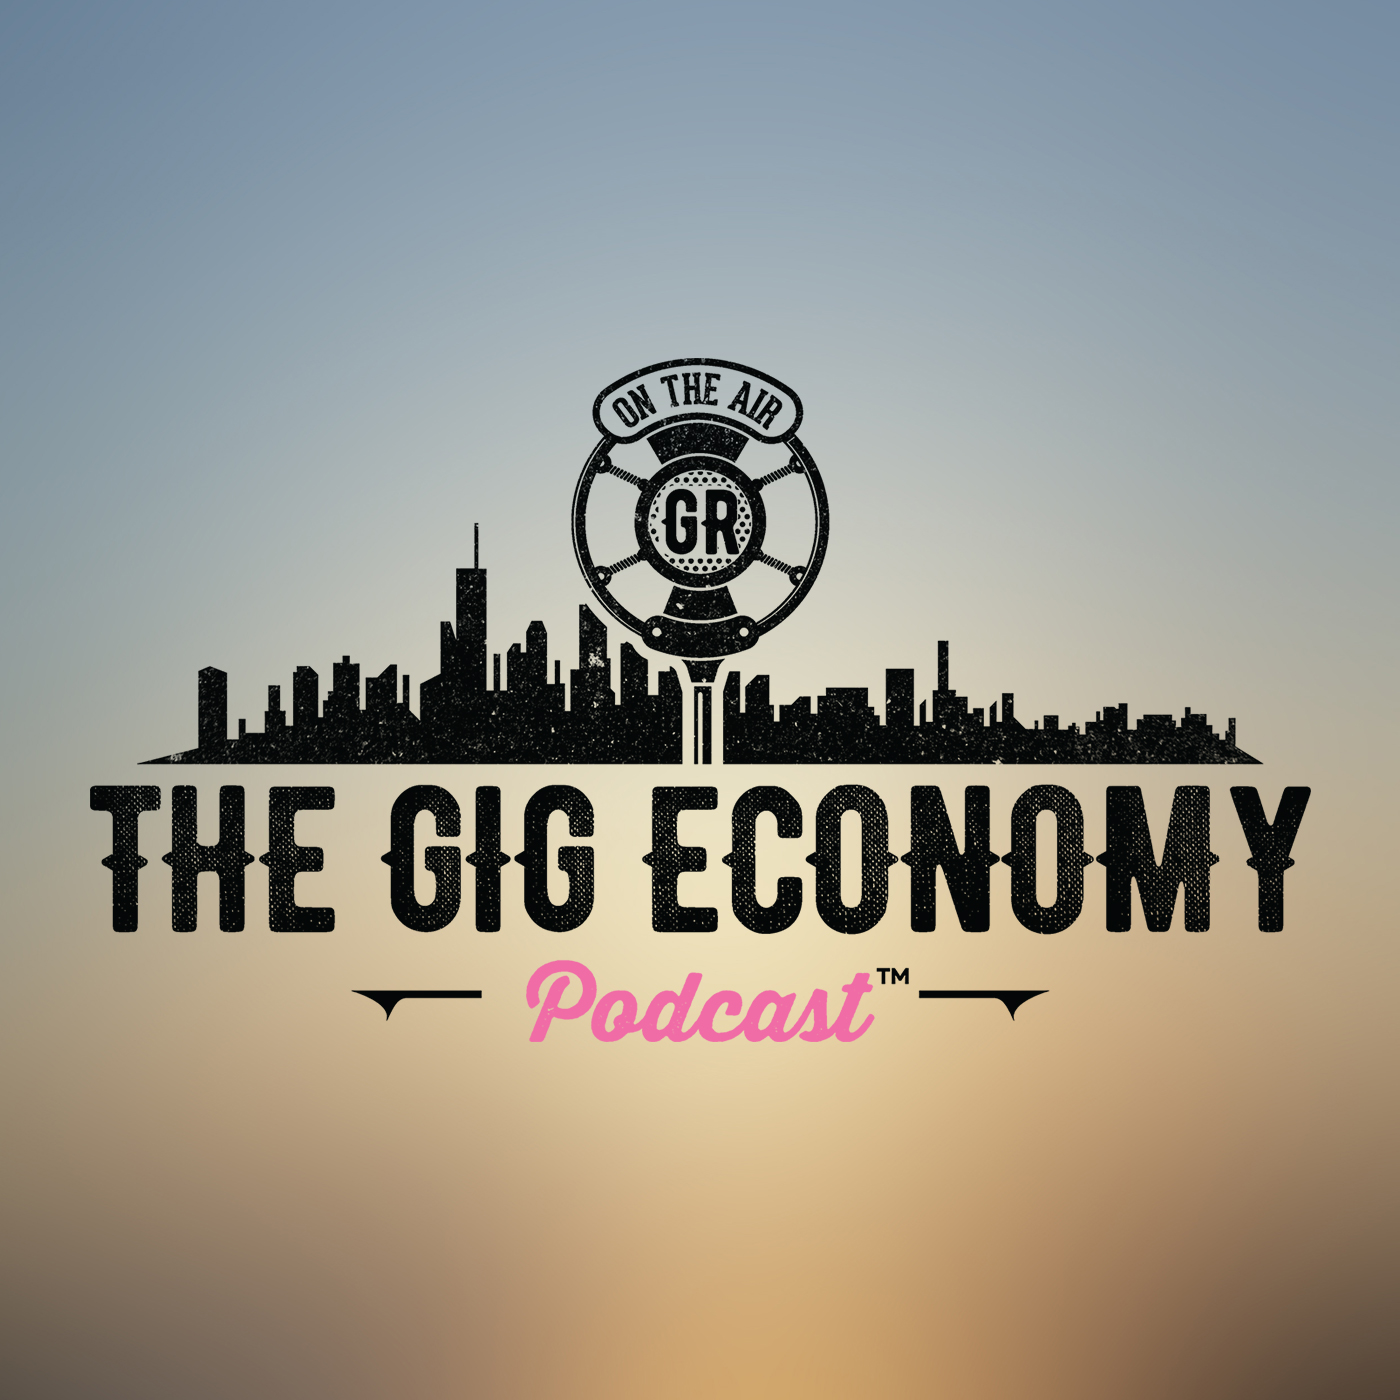 The GIG Economy Podcast show art